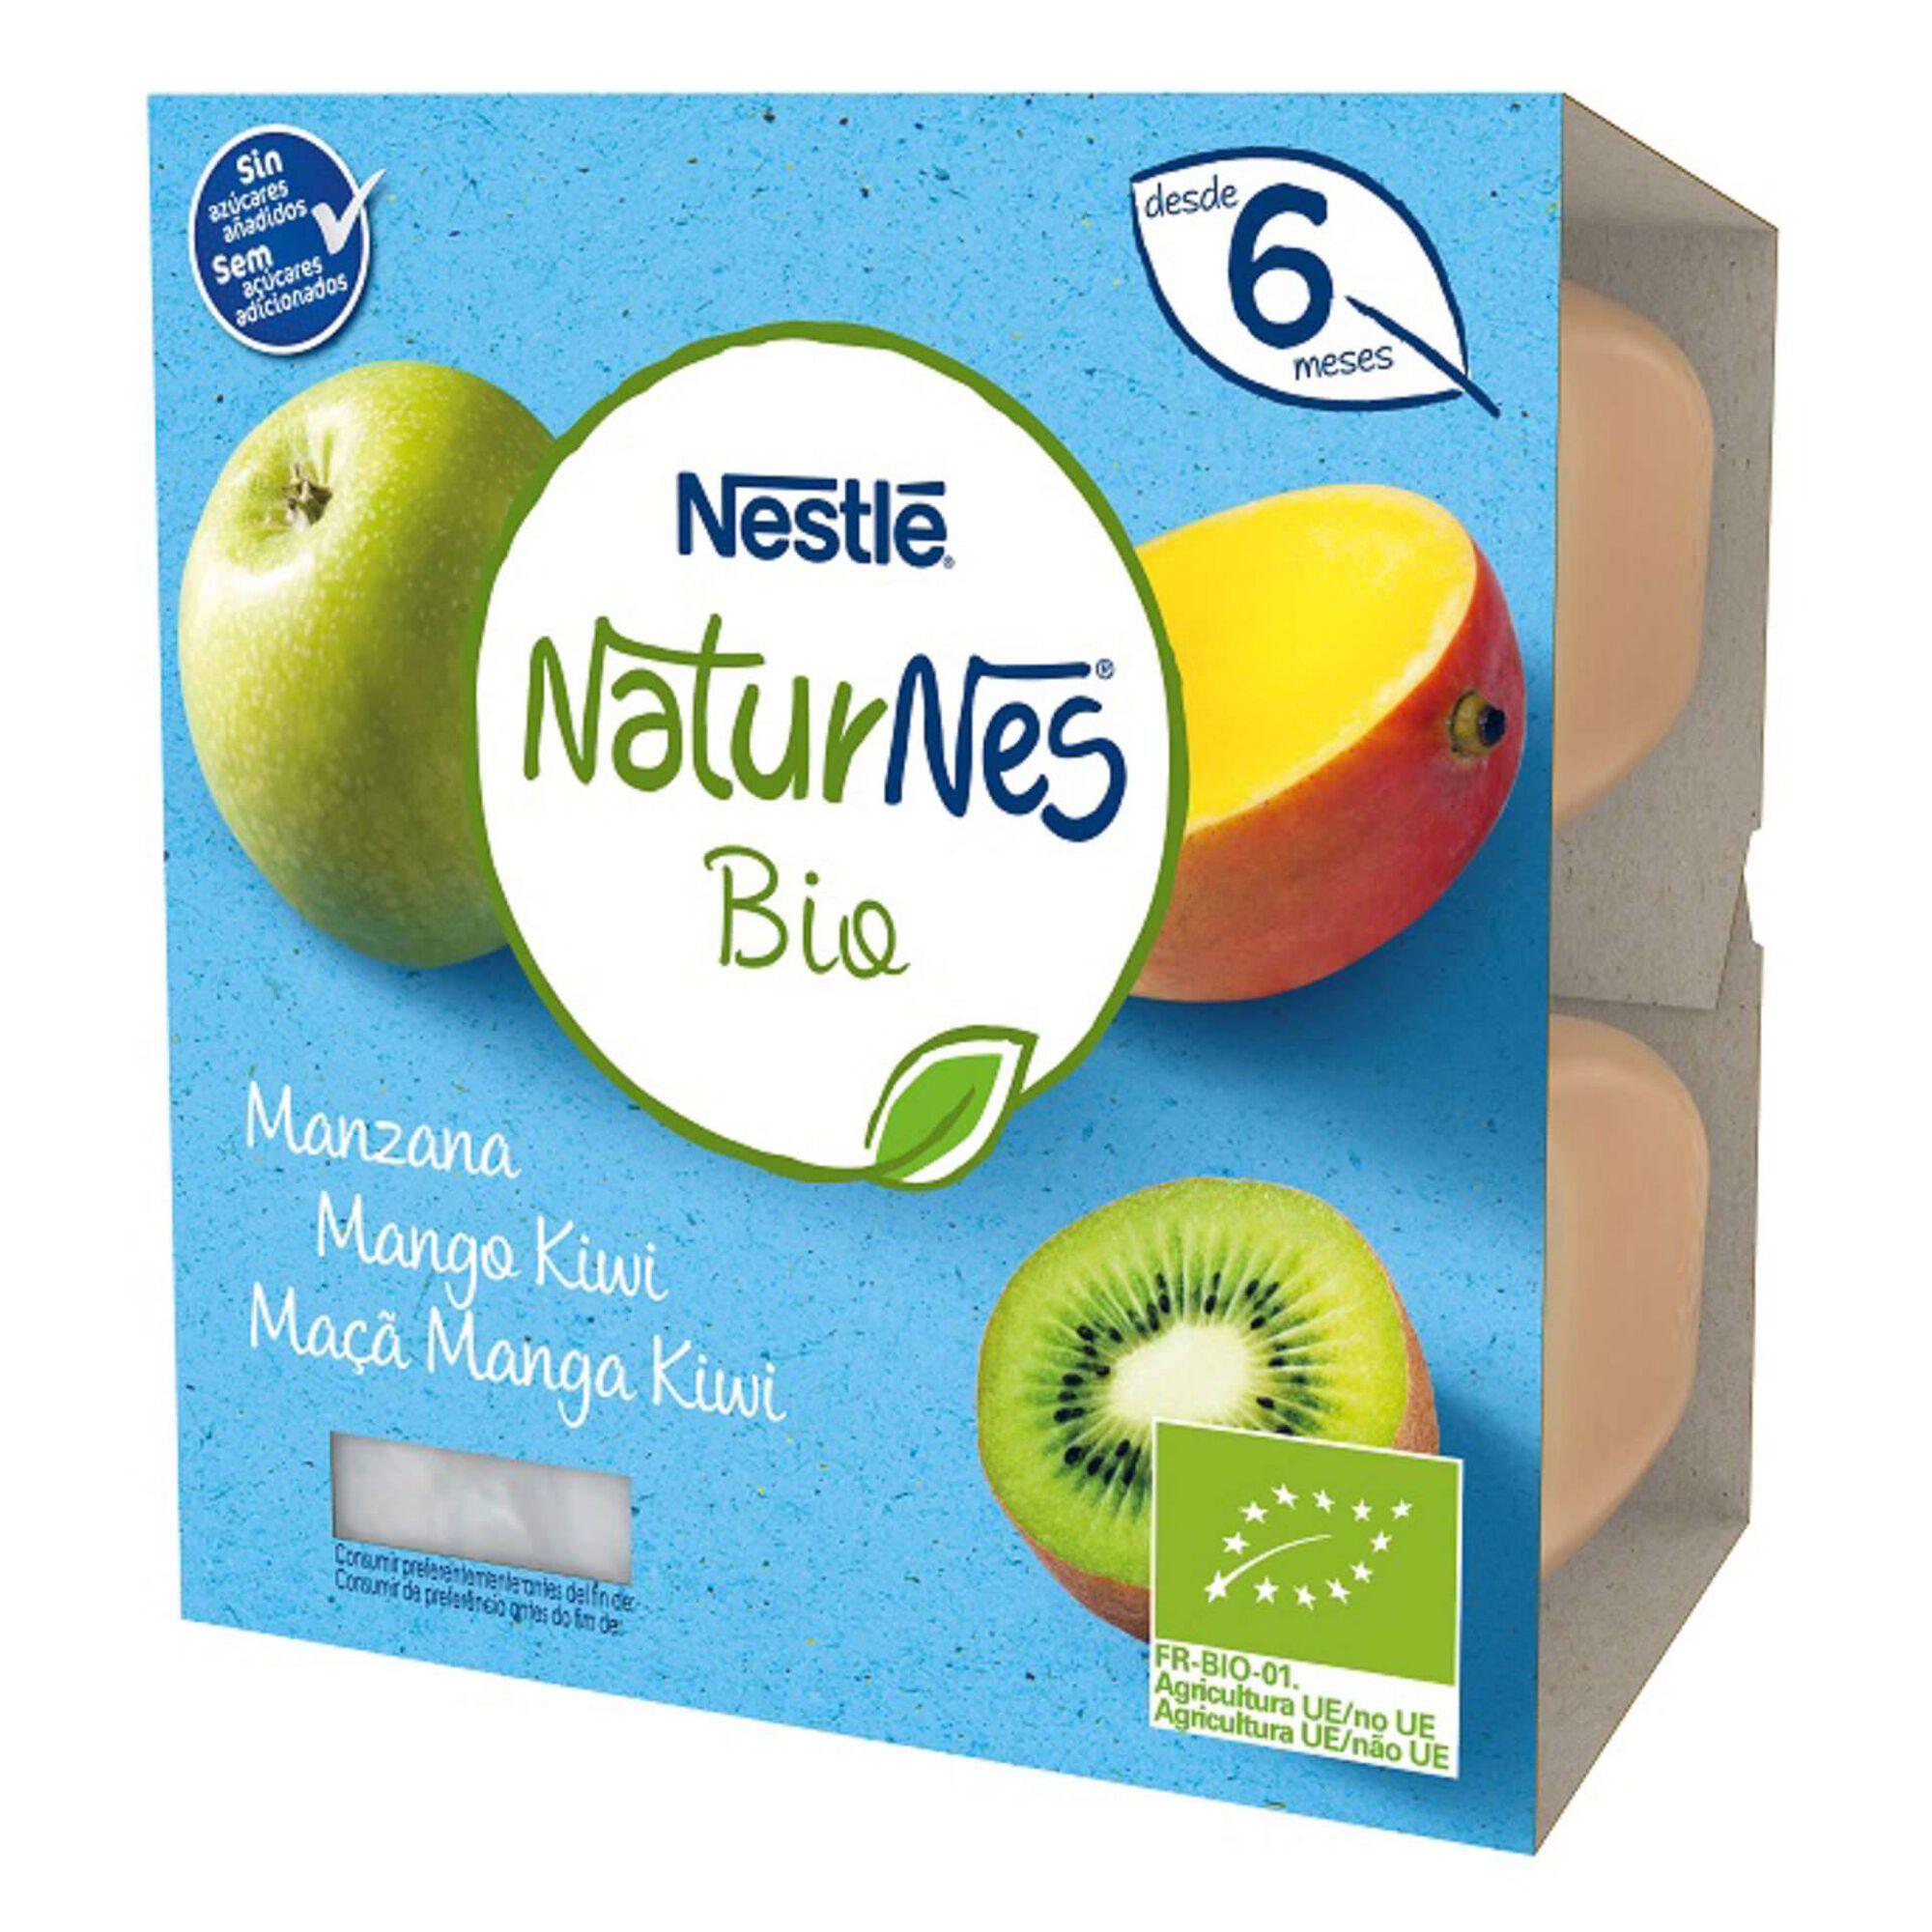 Puré de Fruta Maçã, Manga e Kiwi Naturnes Bio +6 Meses